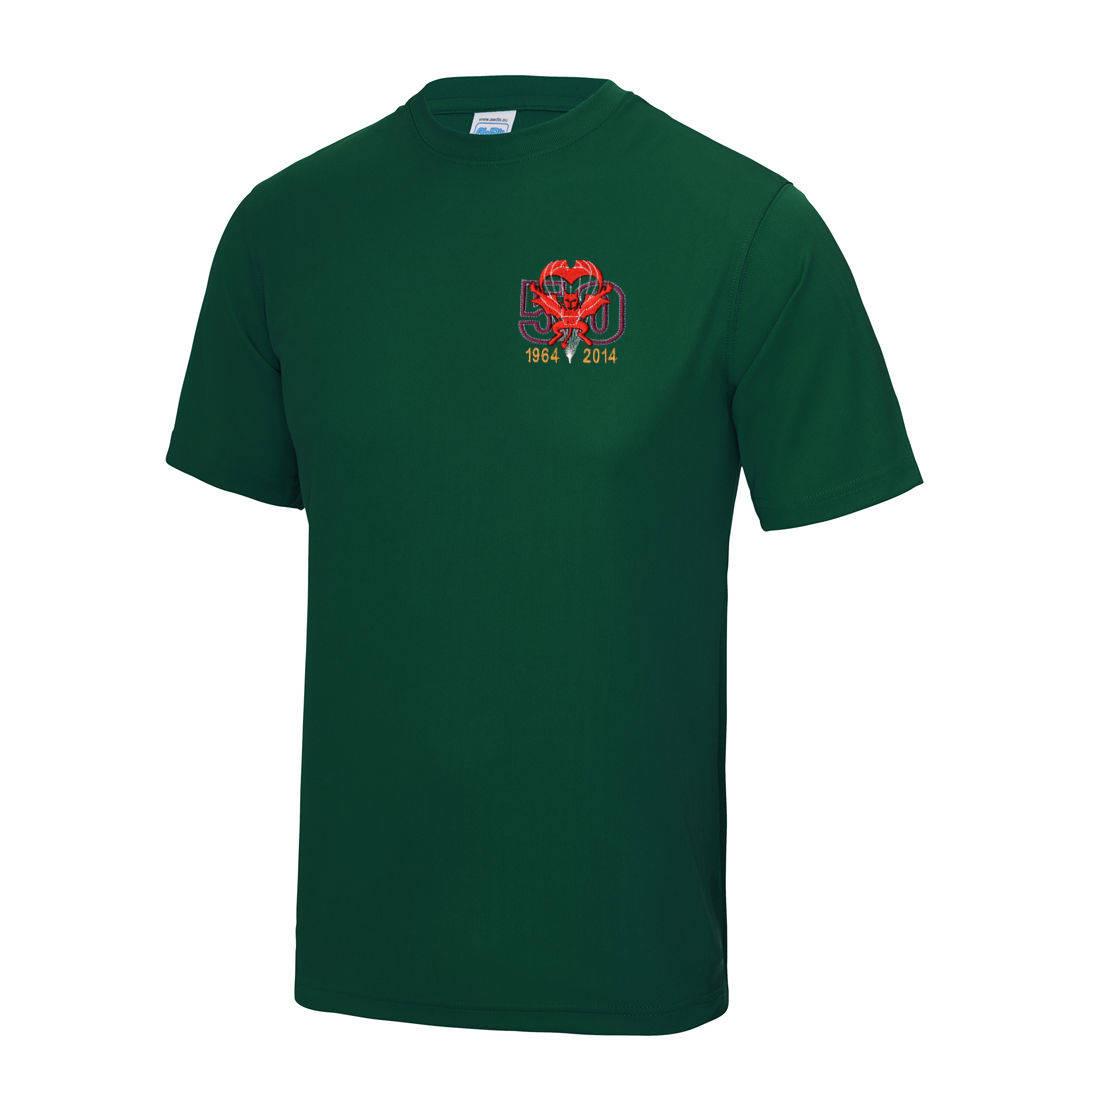 Gym Training T Shirt The Airborne Shop